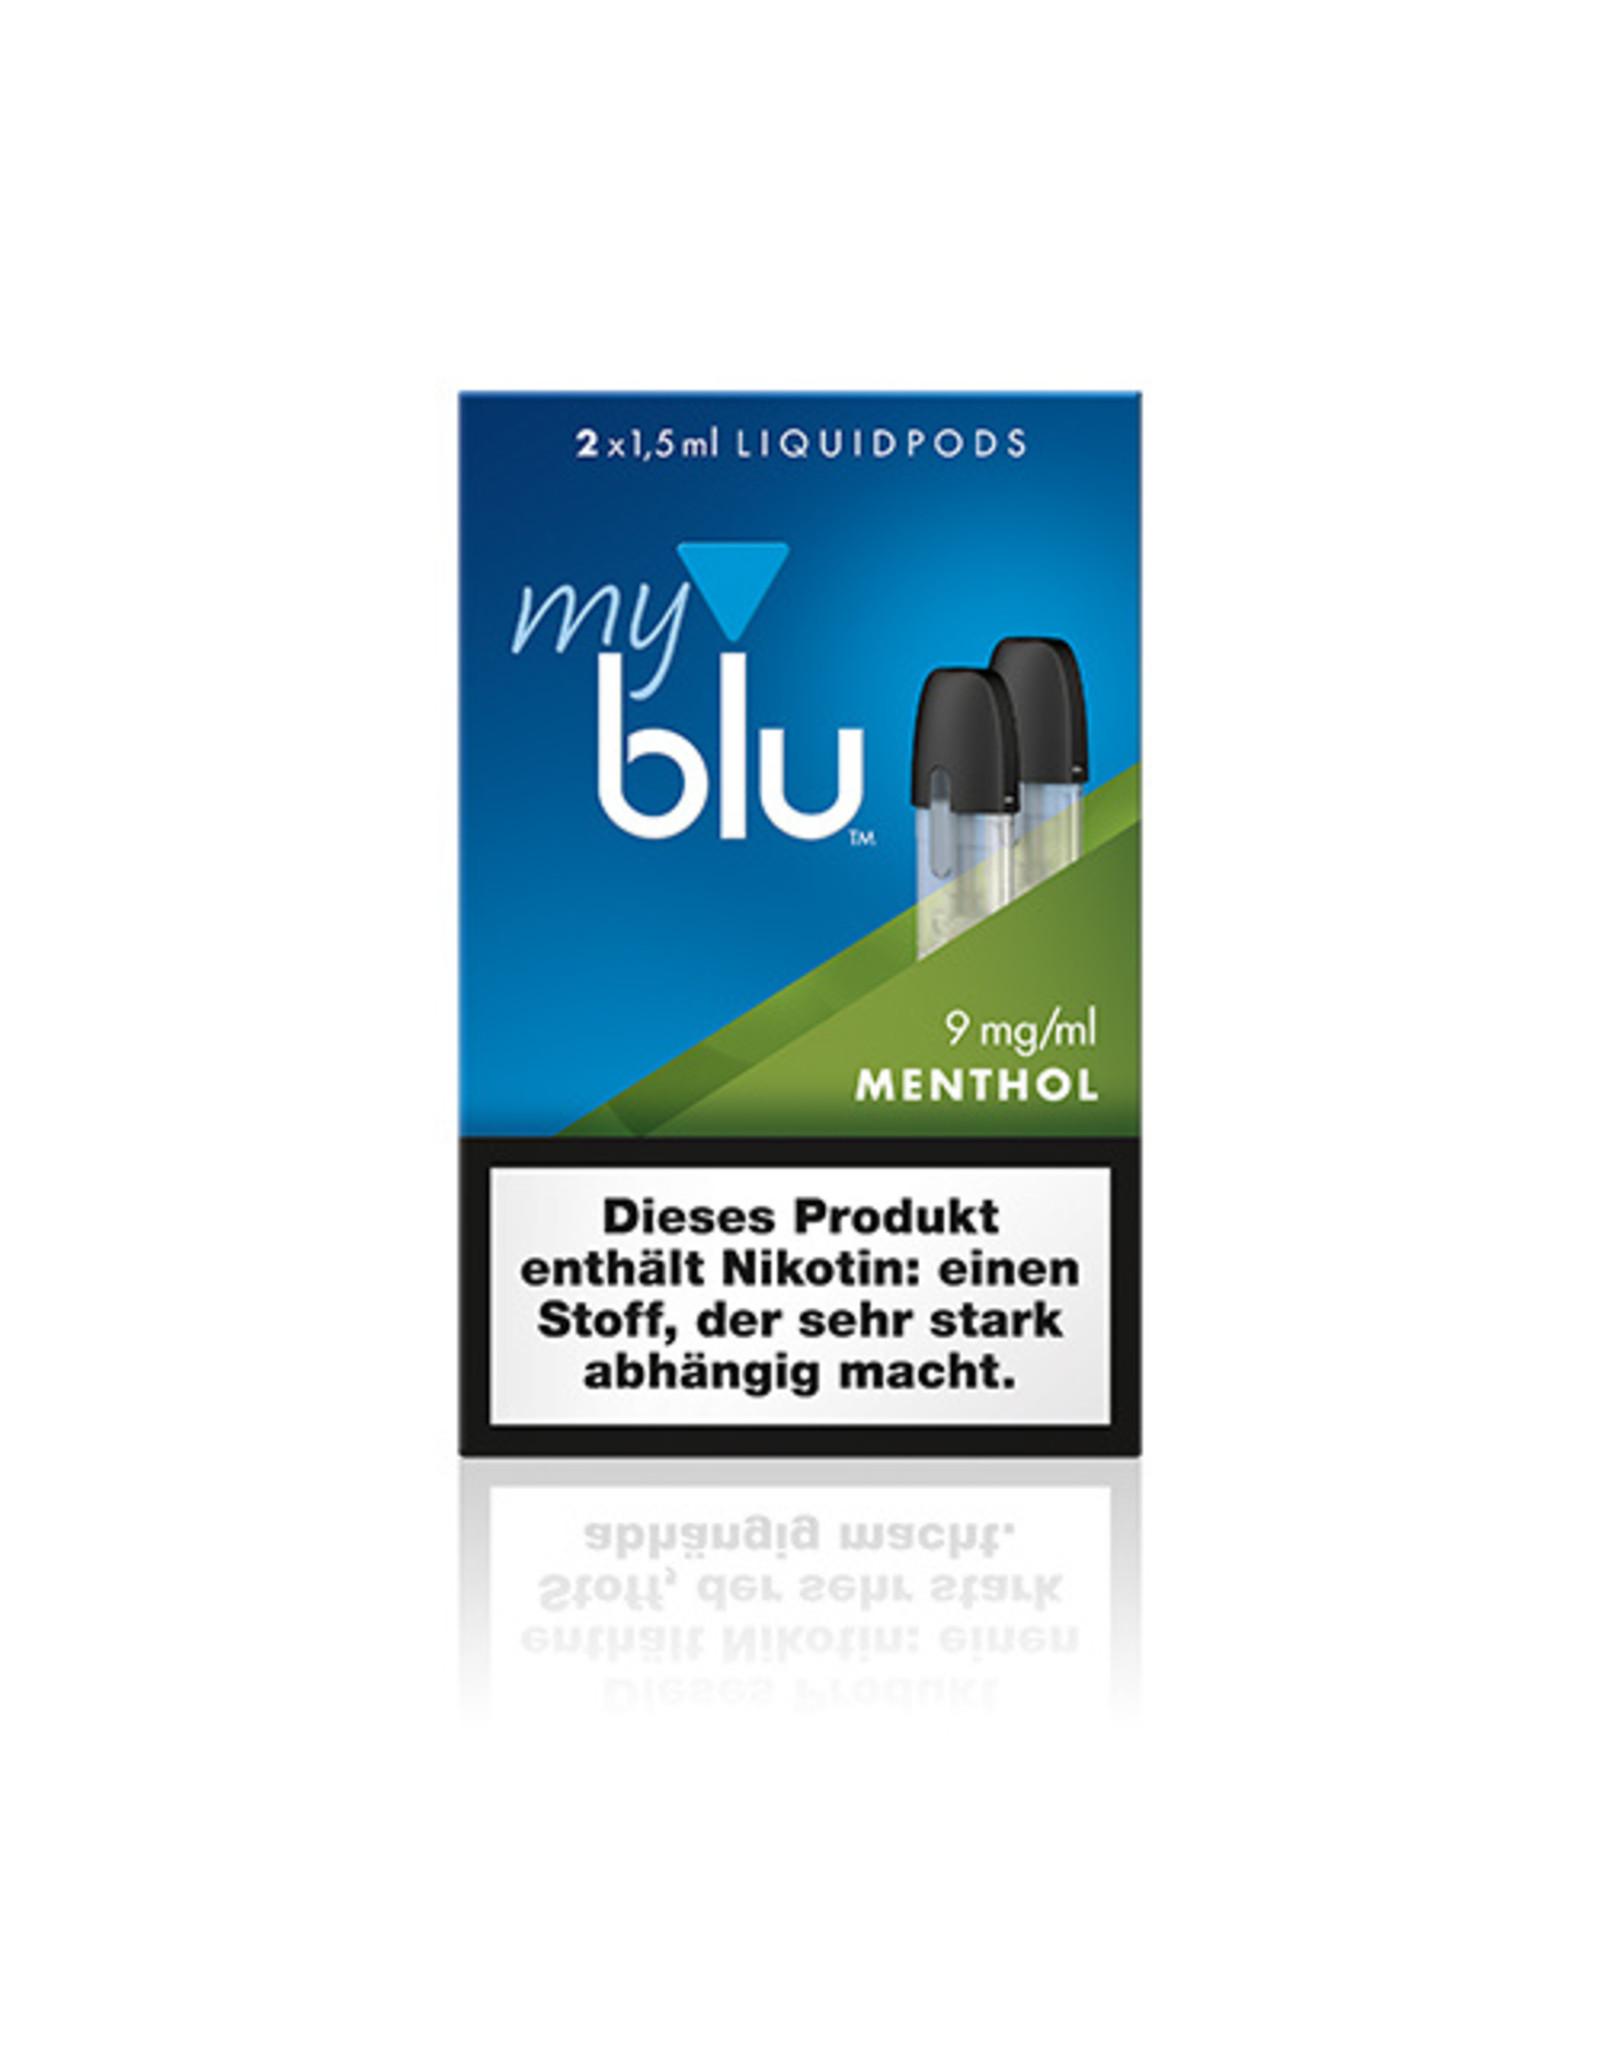 My Blu myblu MENTHOL 9mg/ml LIQUIDPOD